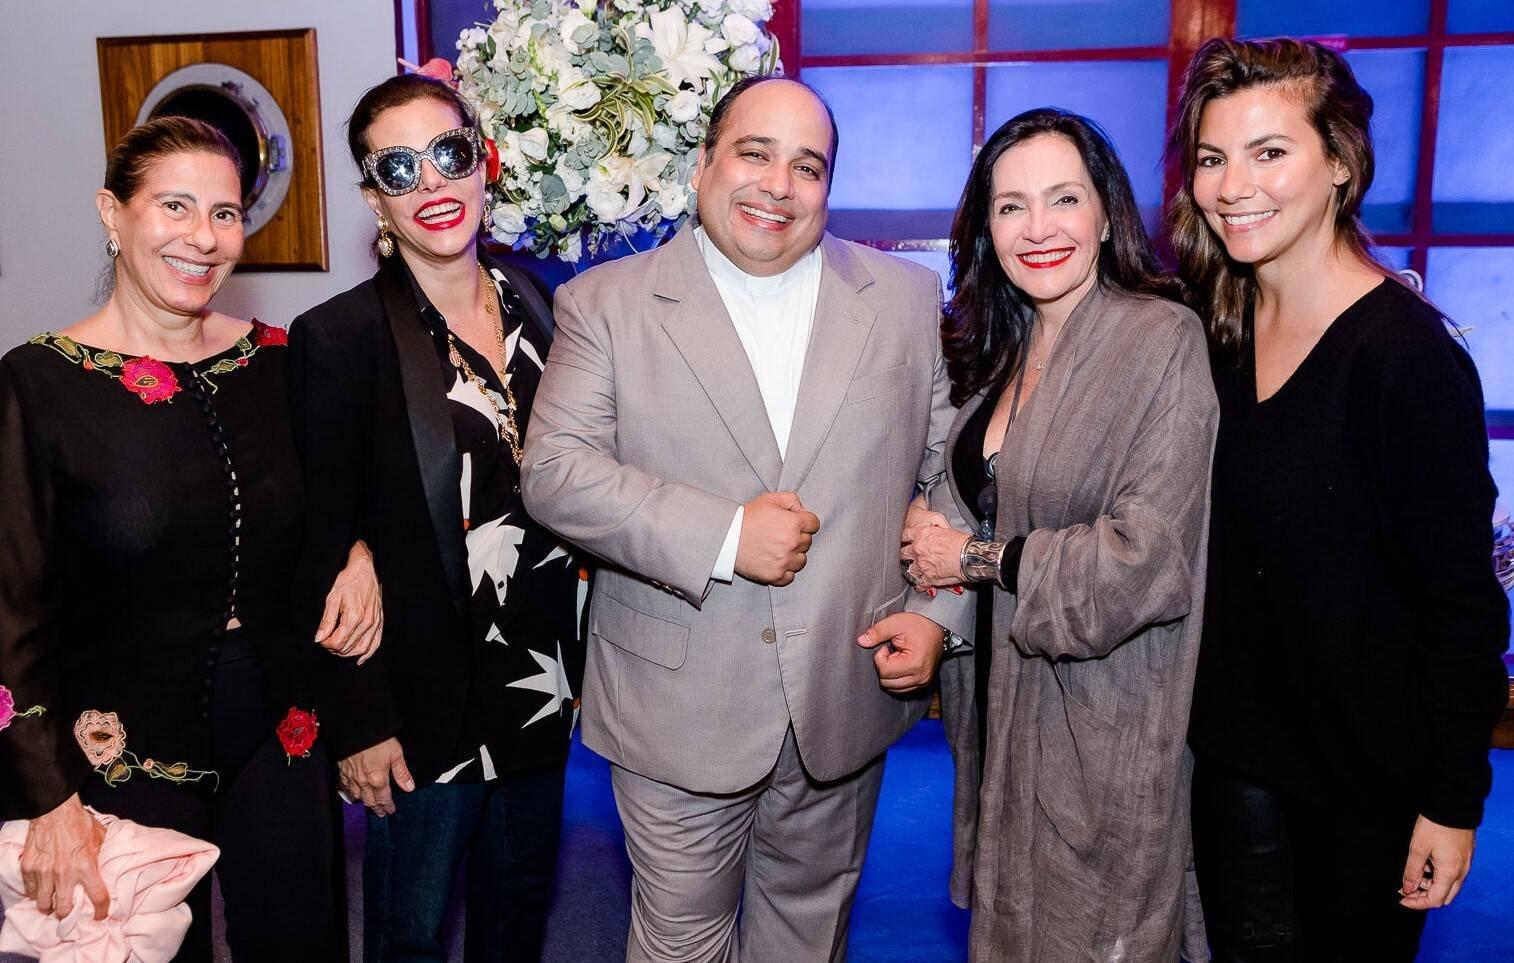 Alice Tamborindeguy, Narcisa Tamborindeguy, Padre Omar, Liliana Rodriguez e Nicole Tamborindeguy /Foto: Bruno Ryfer